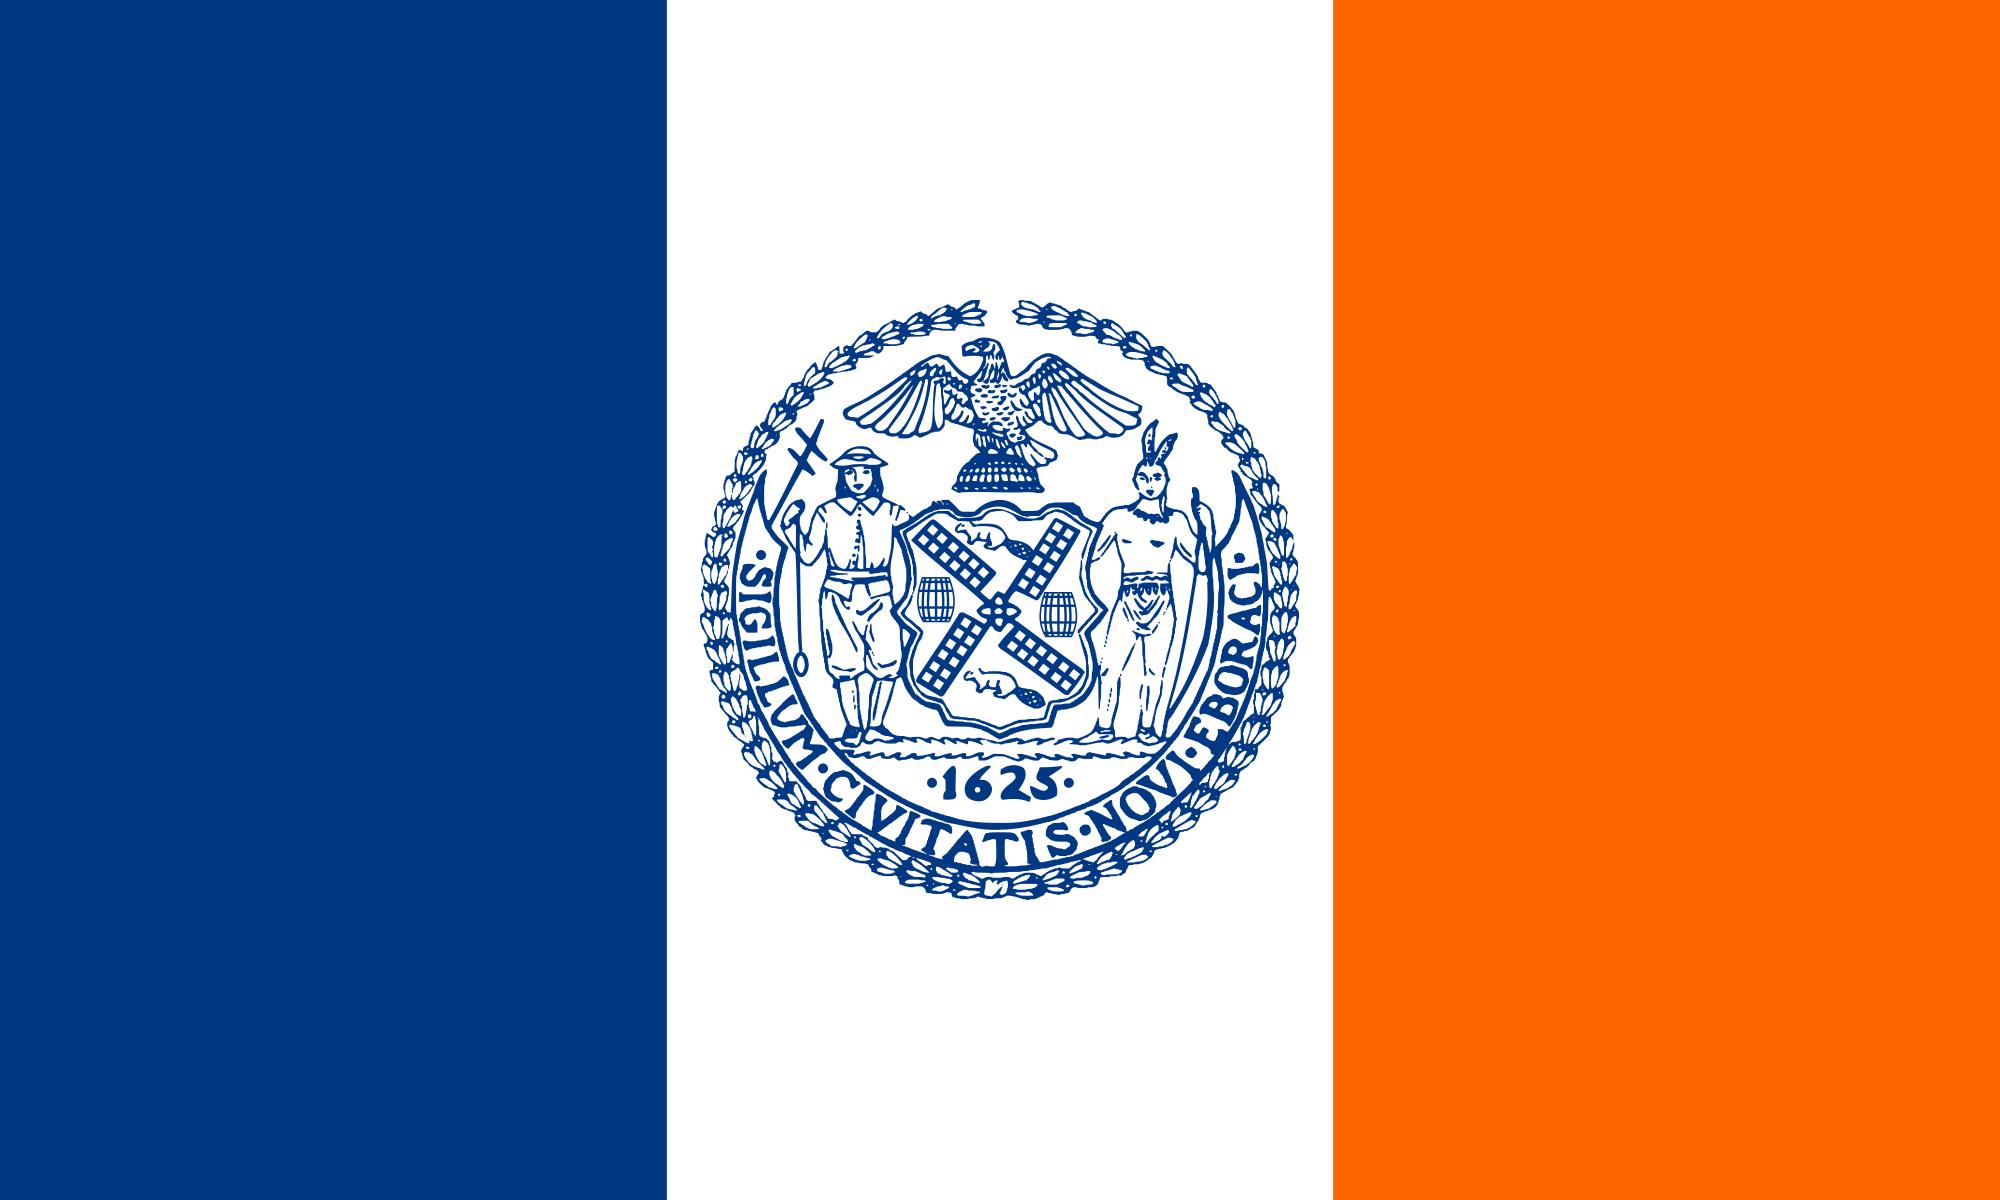 фото нью-йорка флаг